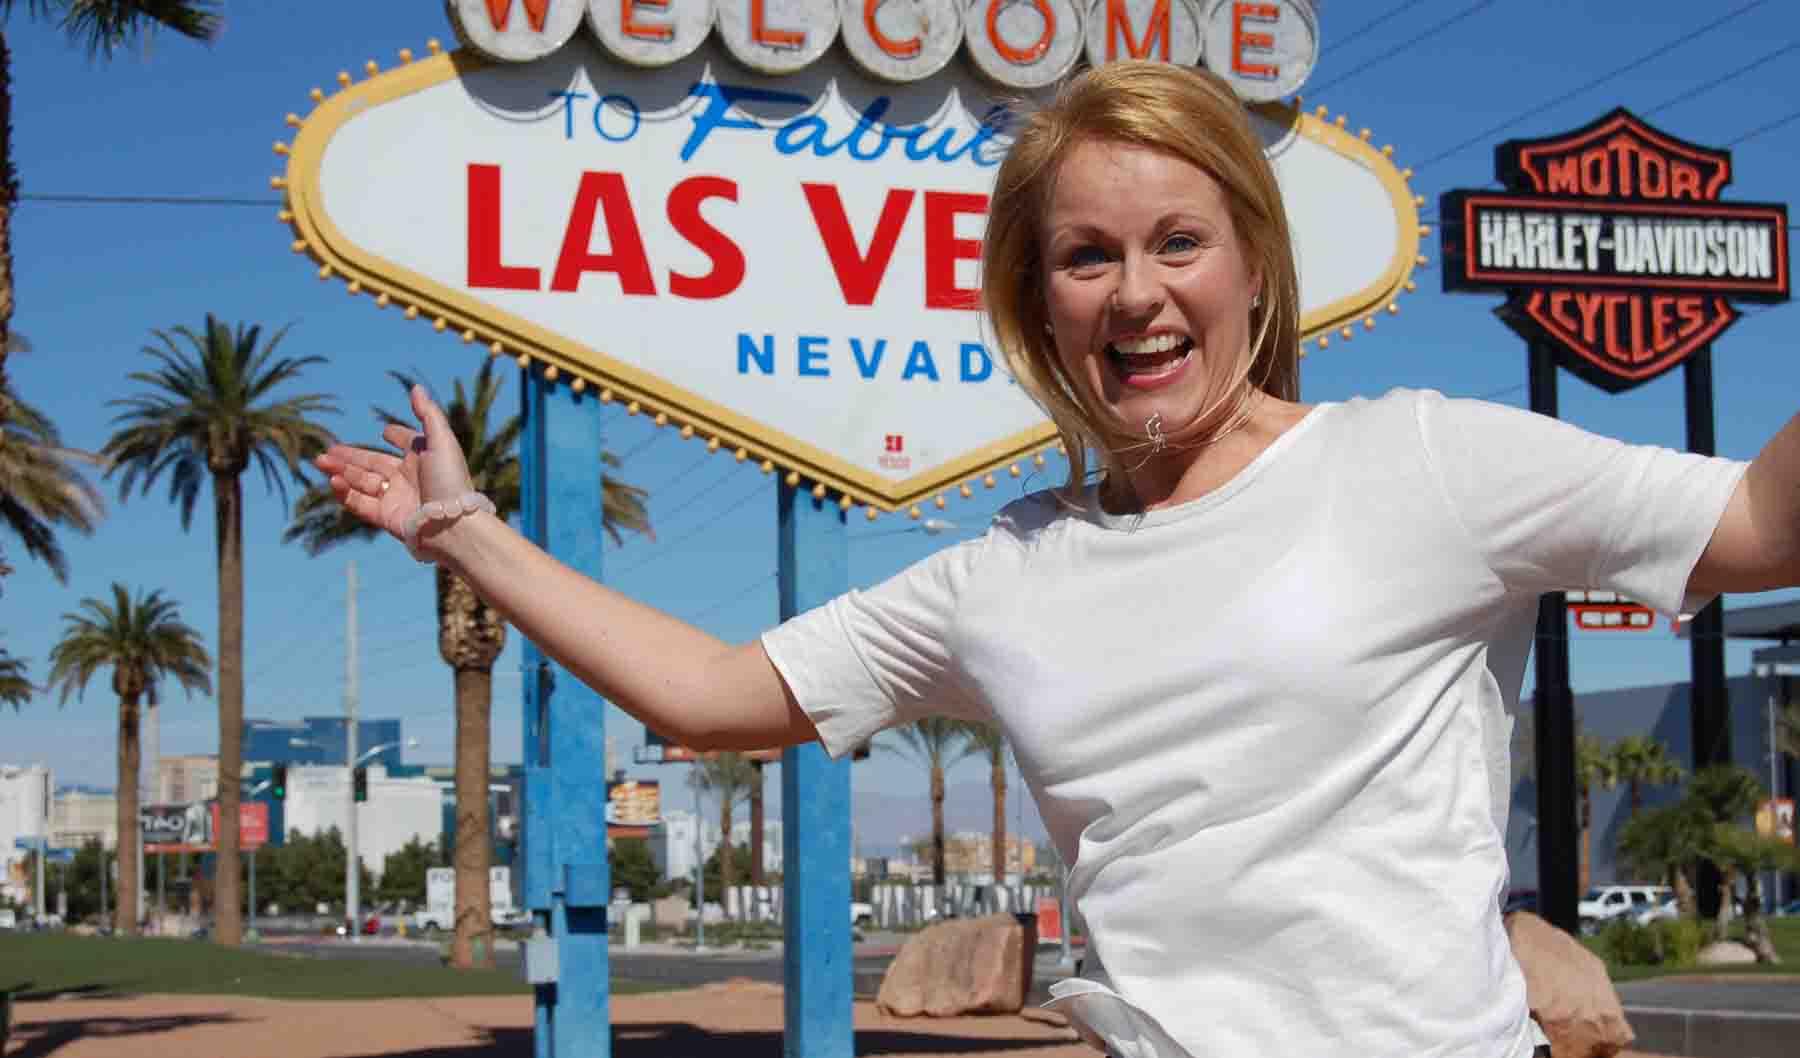 Min favorittby; Las Vegas har alt!